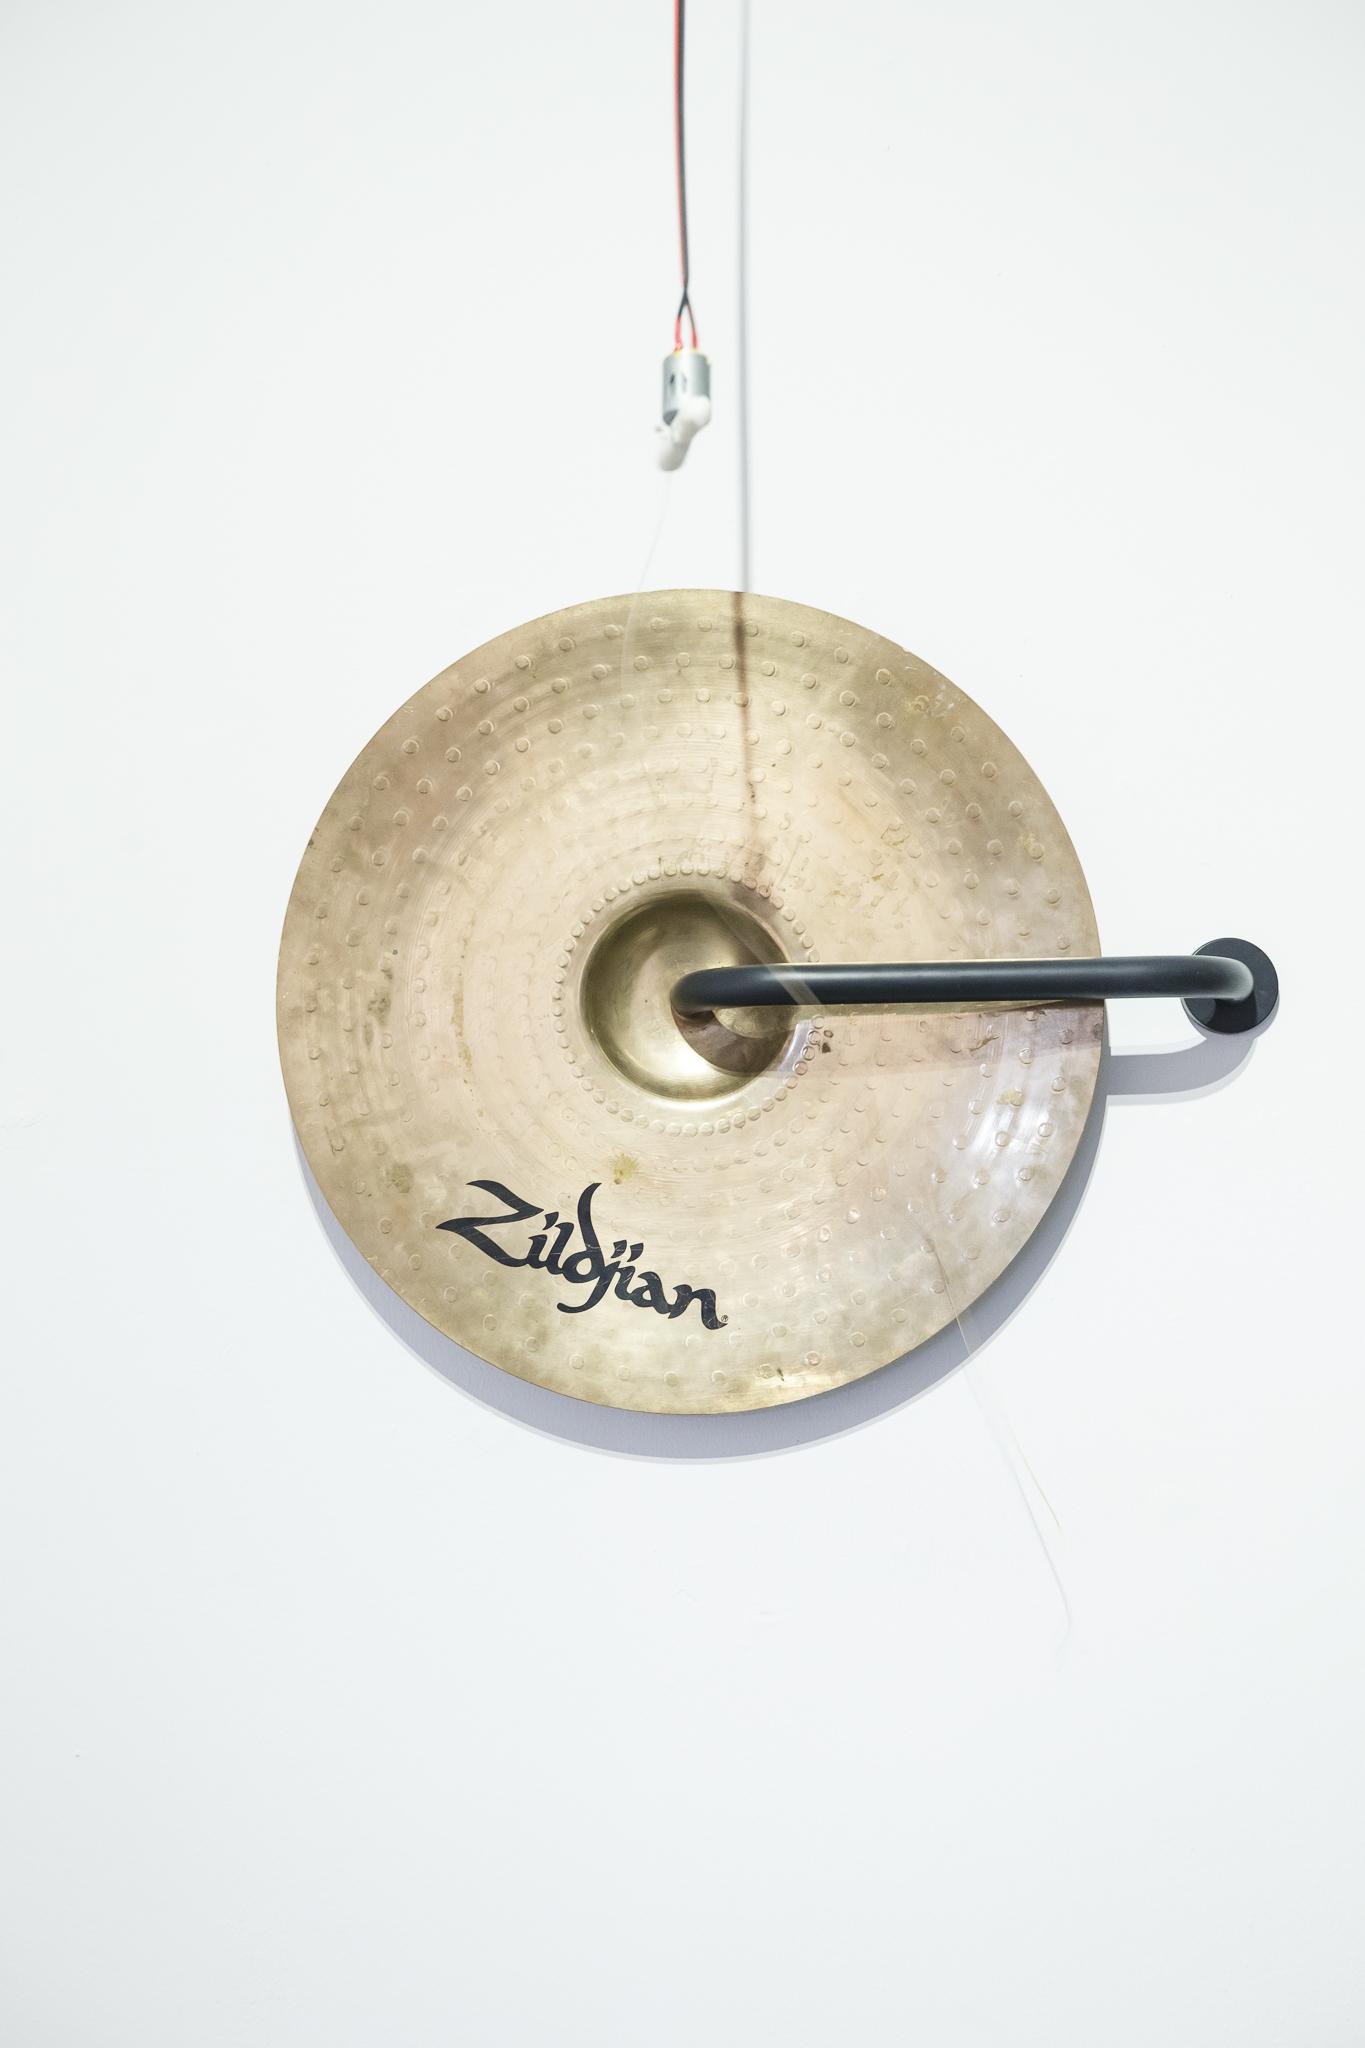 Huijun Lu, Cling, 2018, Cymbal, polymorph, rotating motor, instrument strings, Arduino Uno